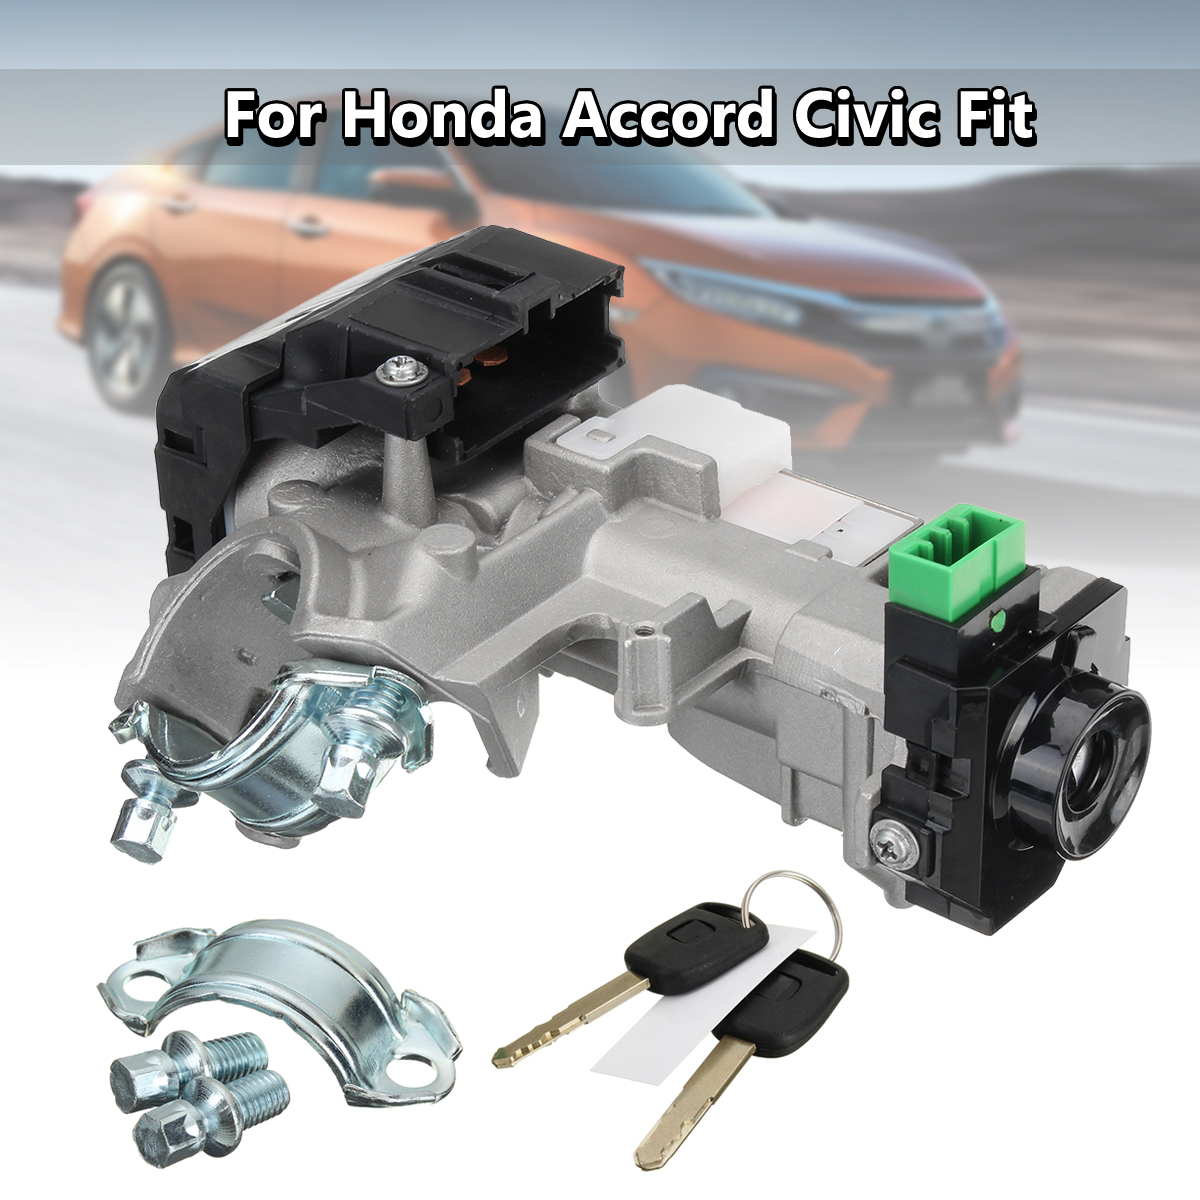 Переключатель зажигания цилиндр замок Авто Trans 2 Ключи для Honda Accord Civic 2003 2004 2005